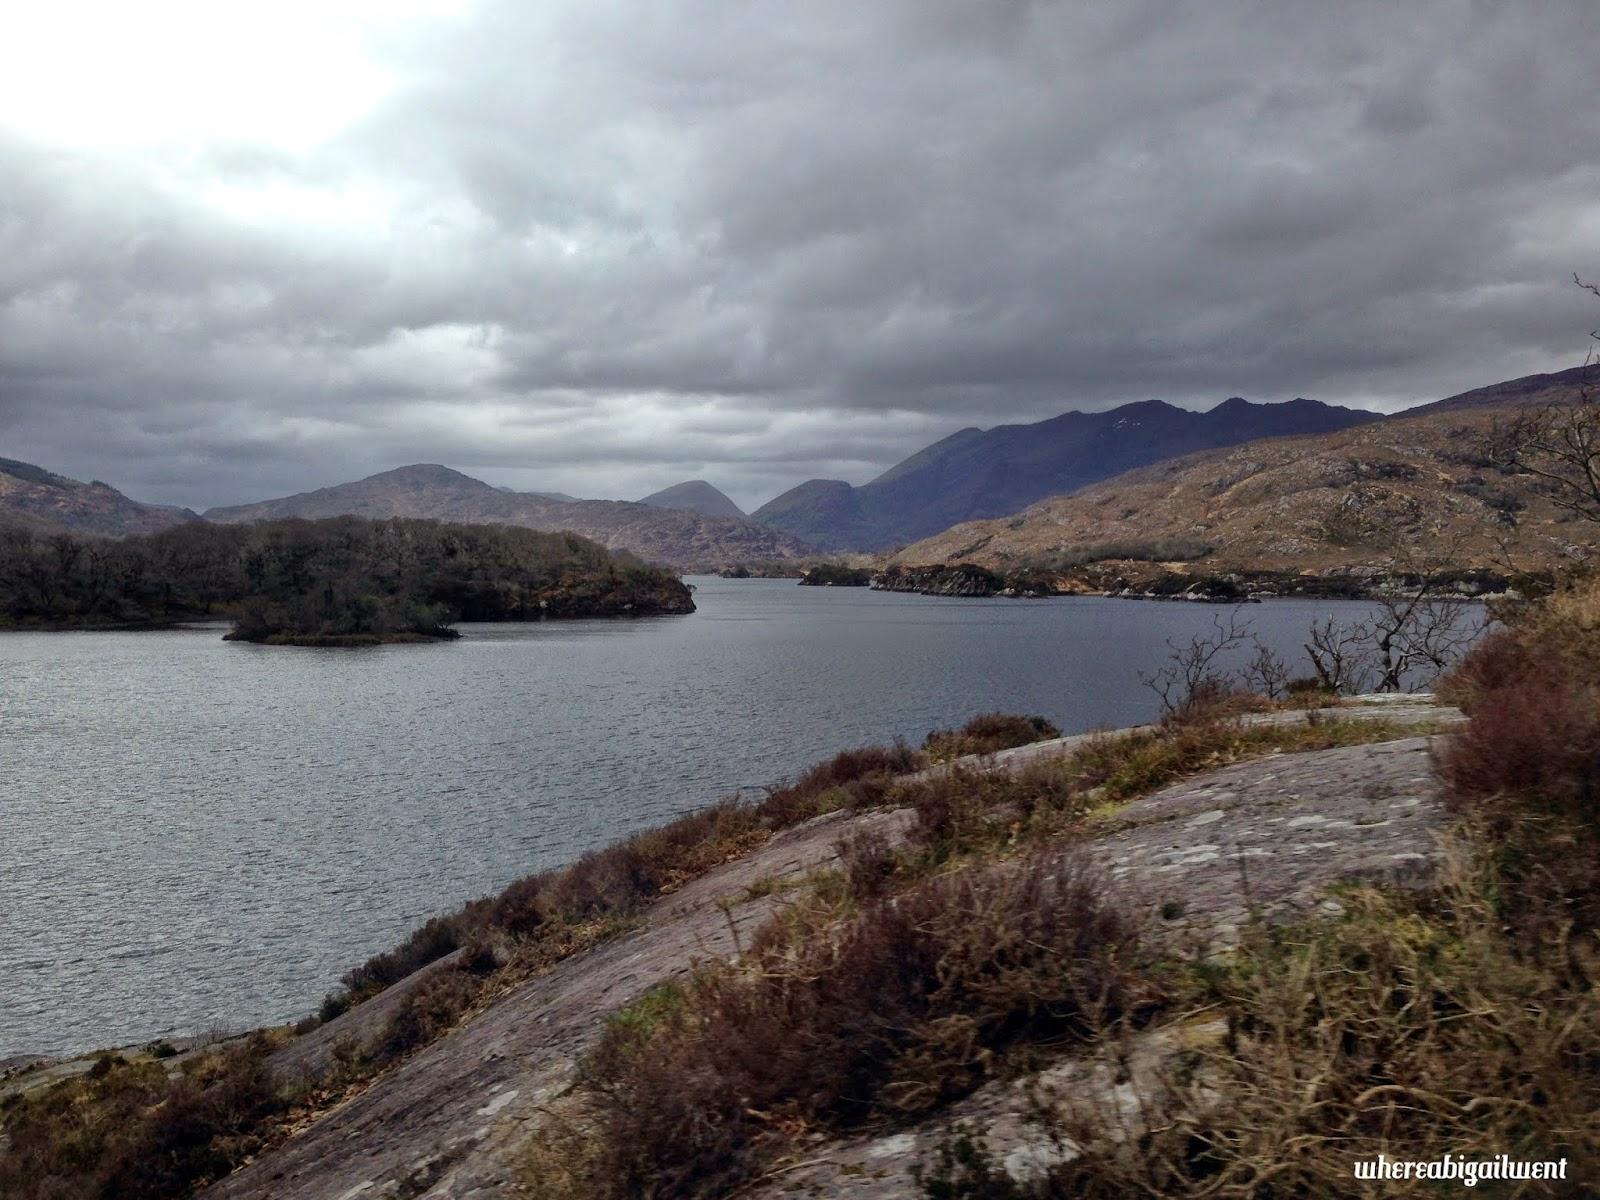 No boating in the Lakes of Killarney